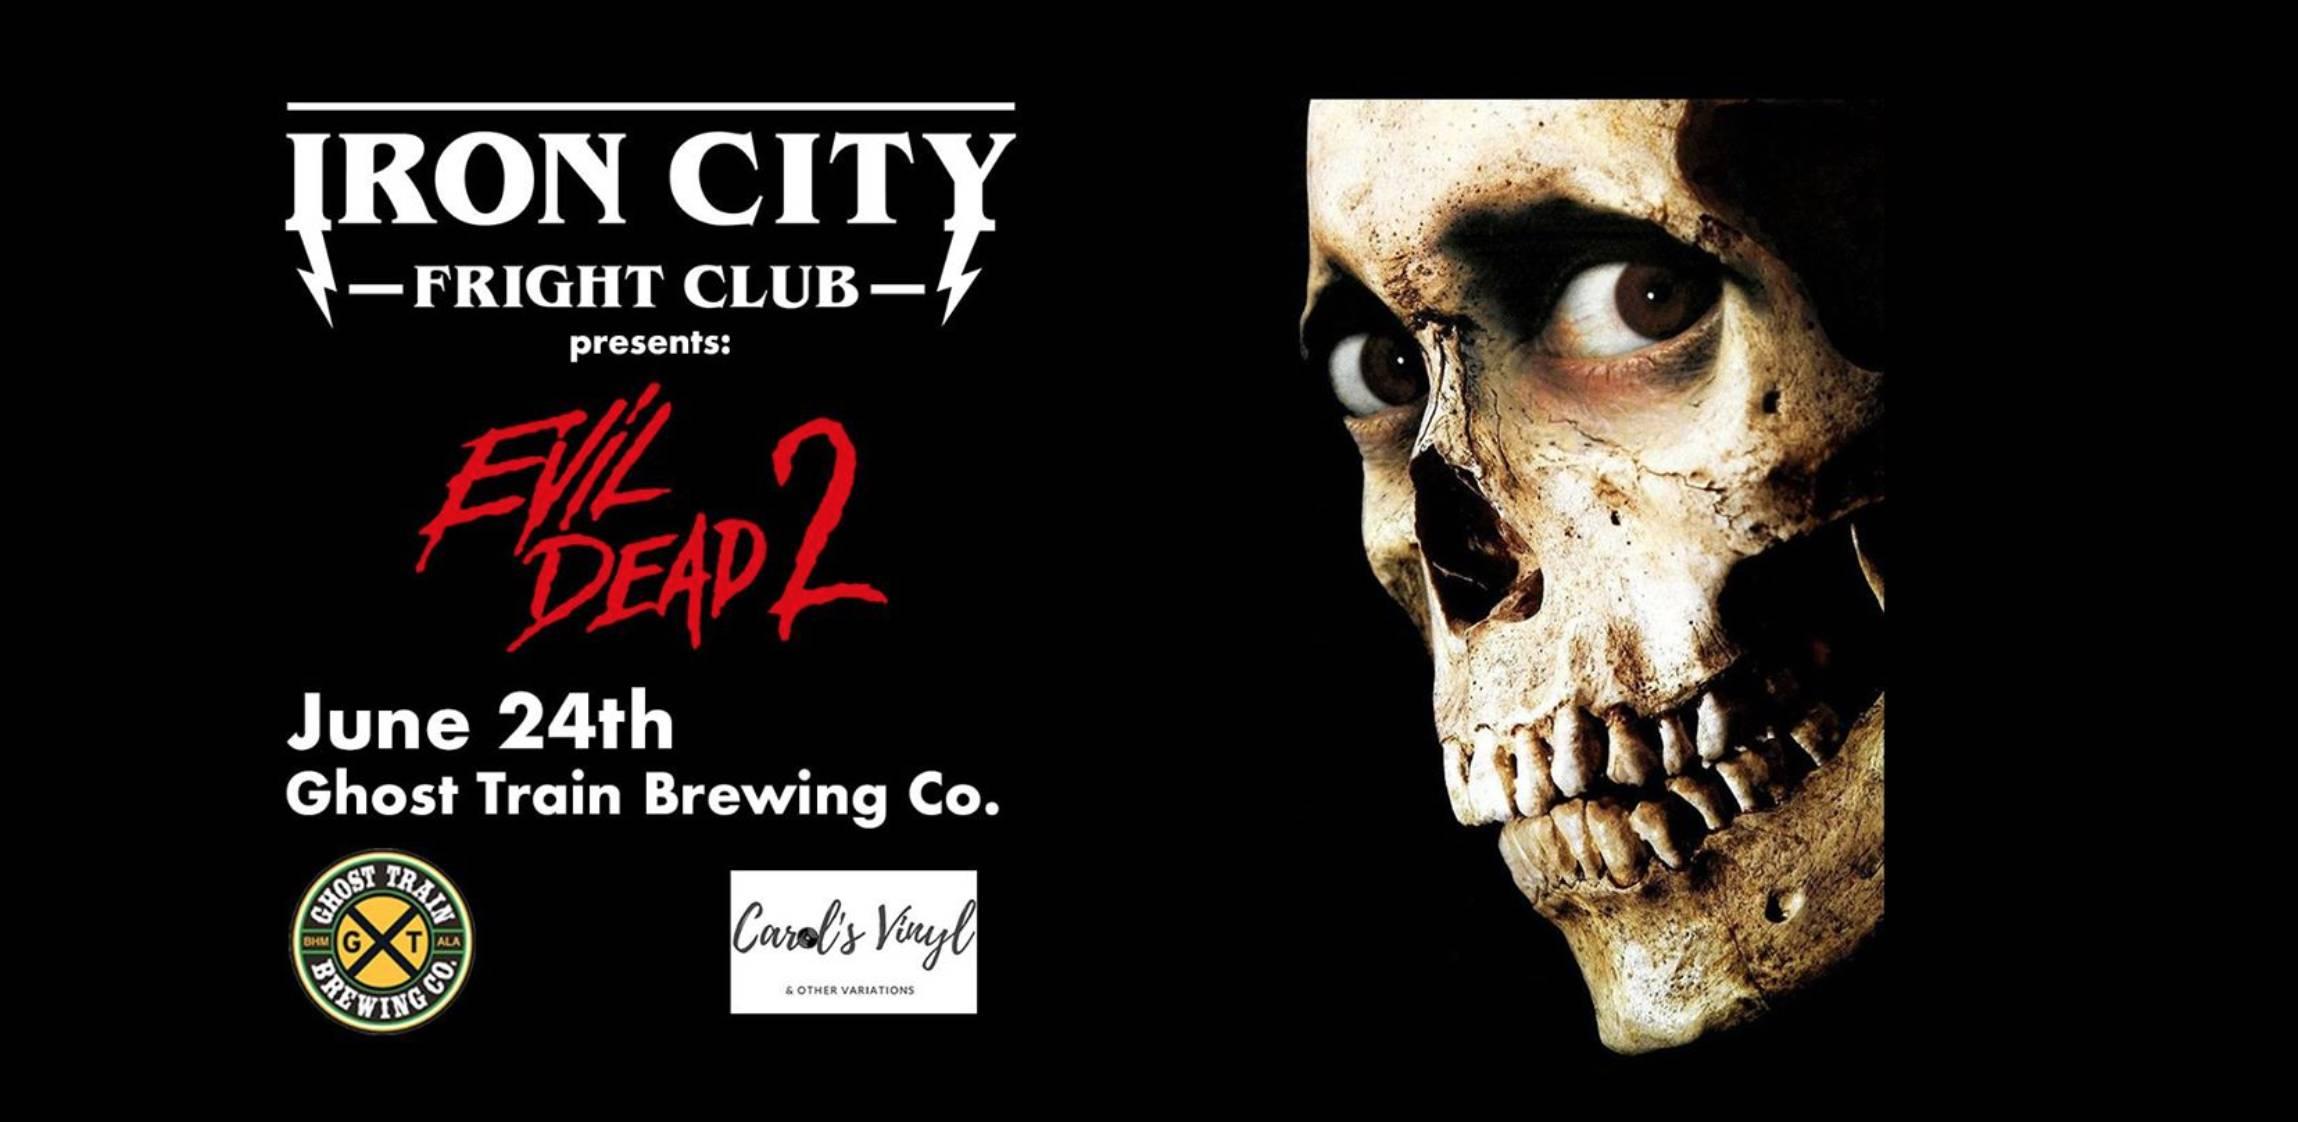 Iron City Fright Club Presents: Evil Dead 2